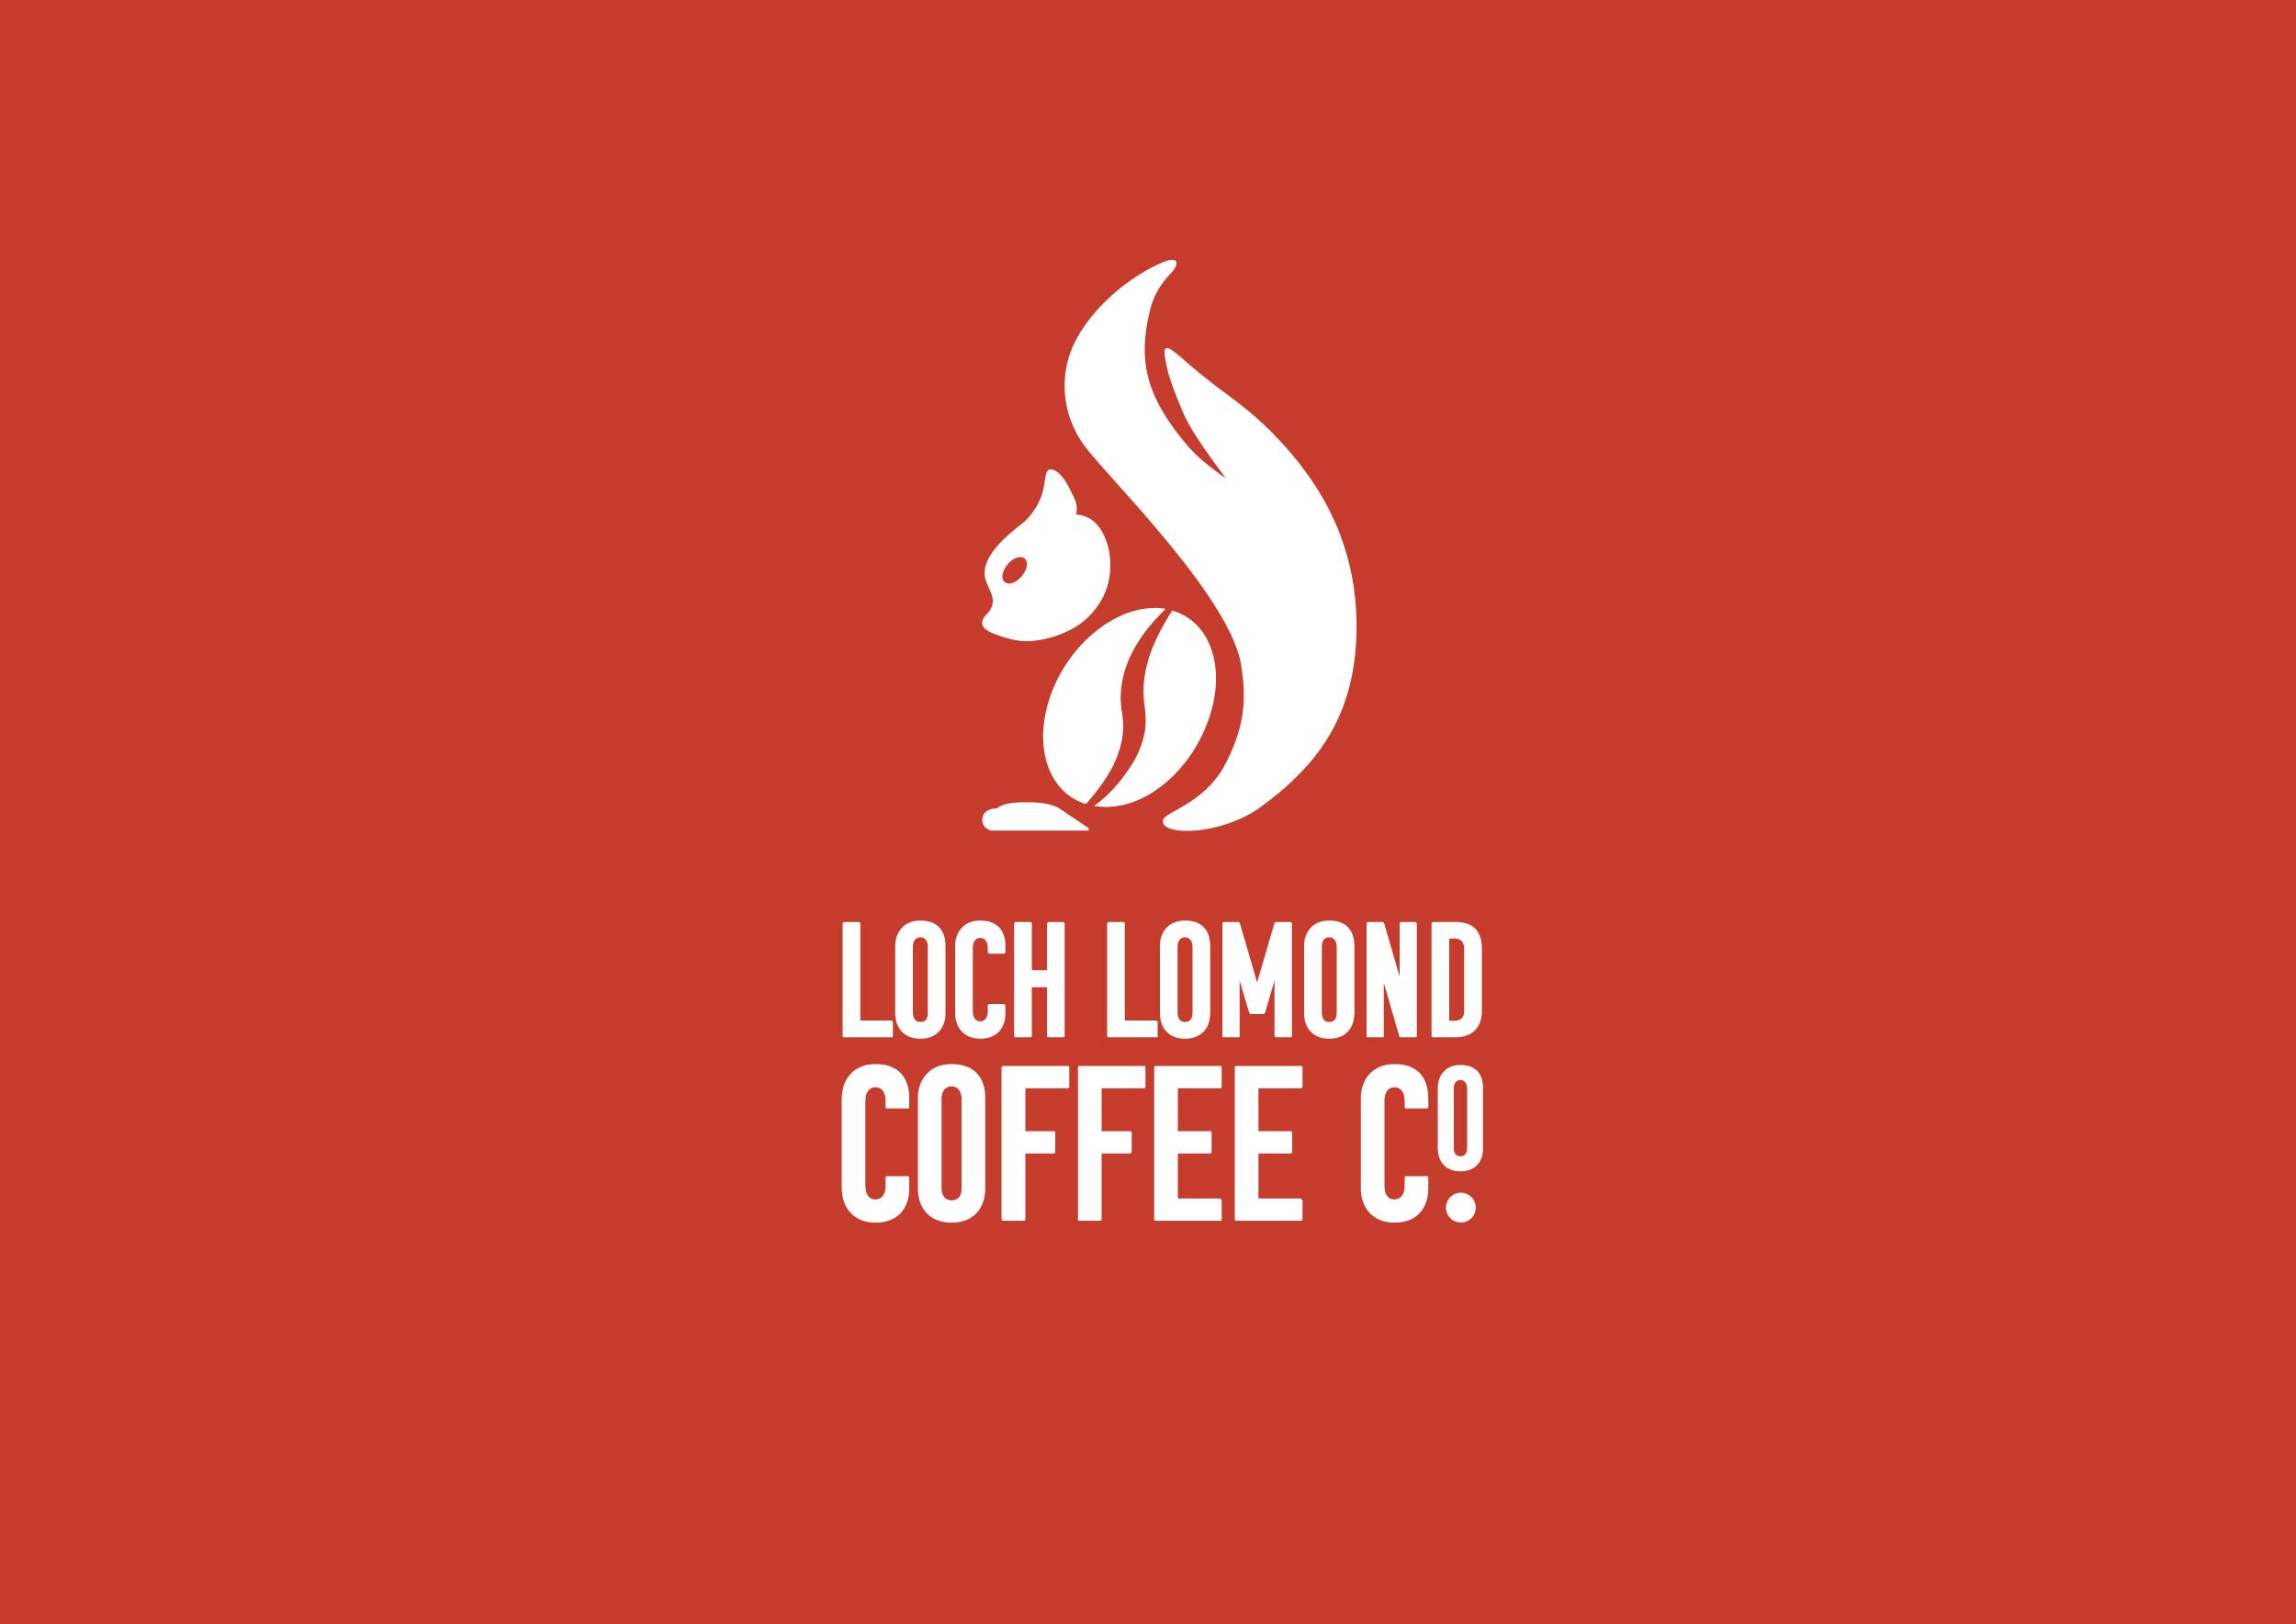 Loch Lomond Coffee Co. branding